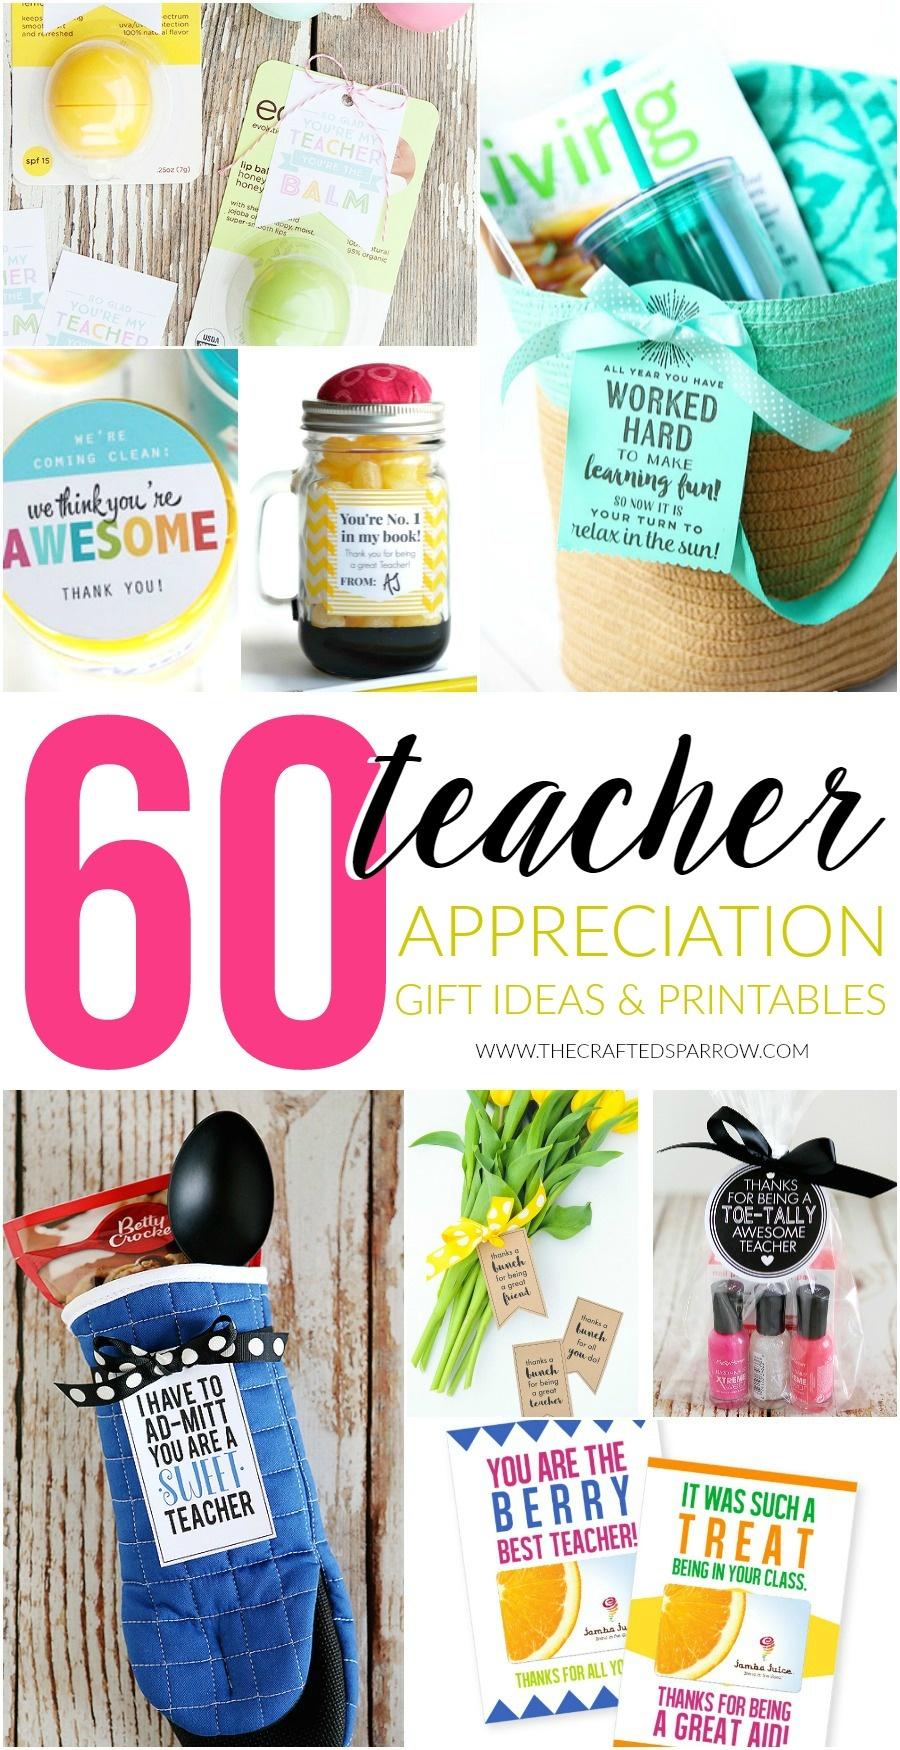 60 Teacher Appreciation Gift Ideas & Printables - Free Printable Teacher Appreciation Gift Tags